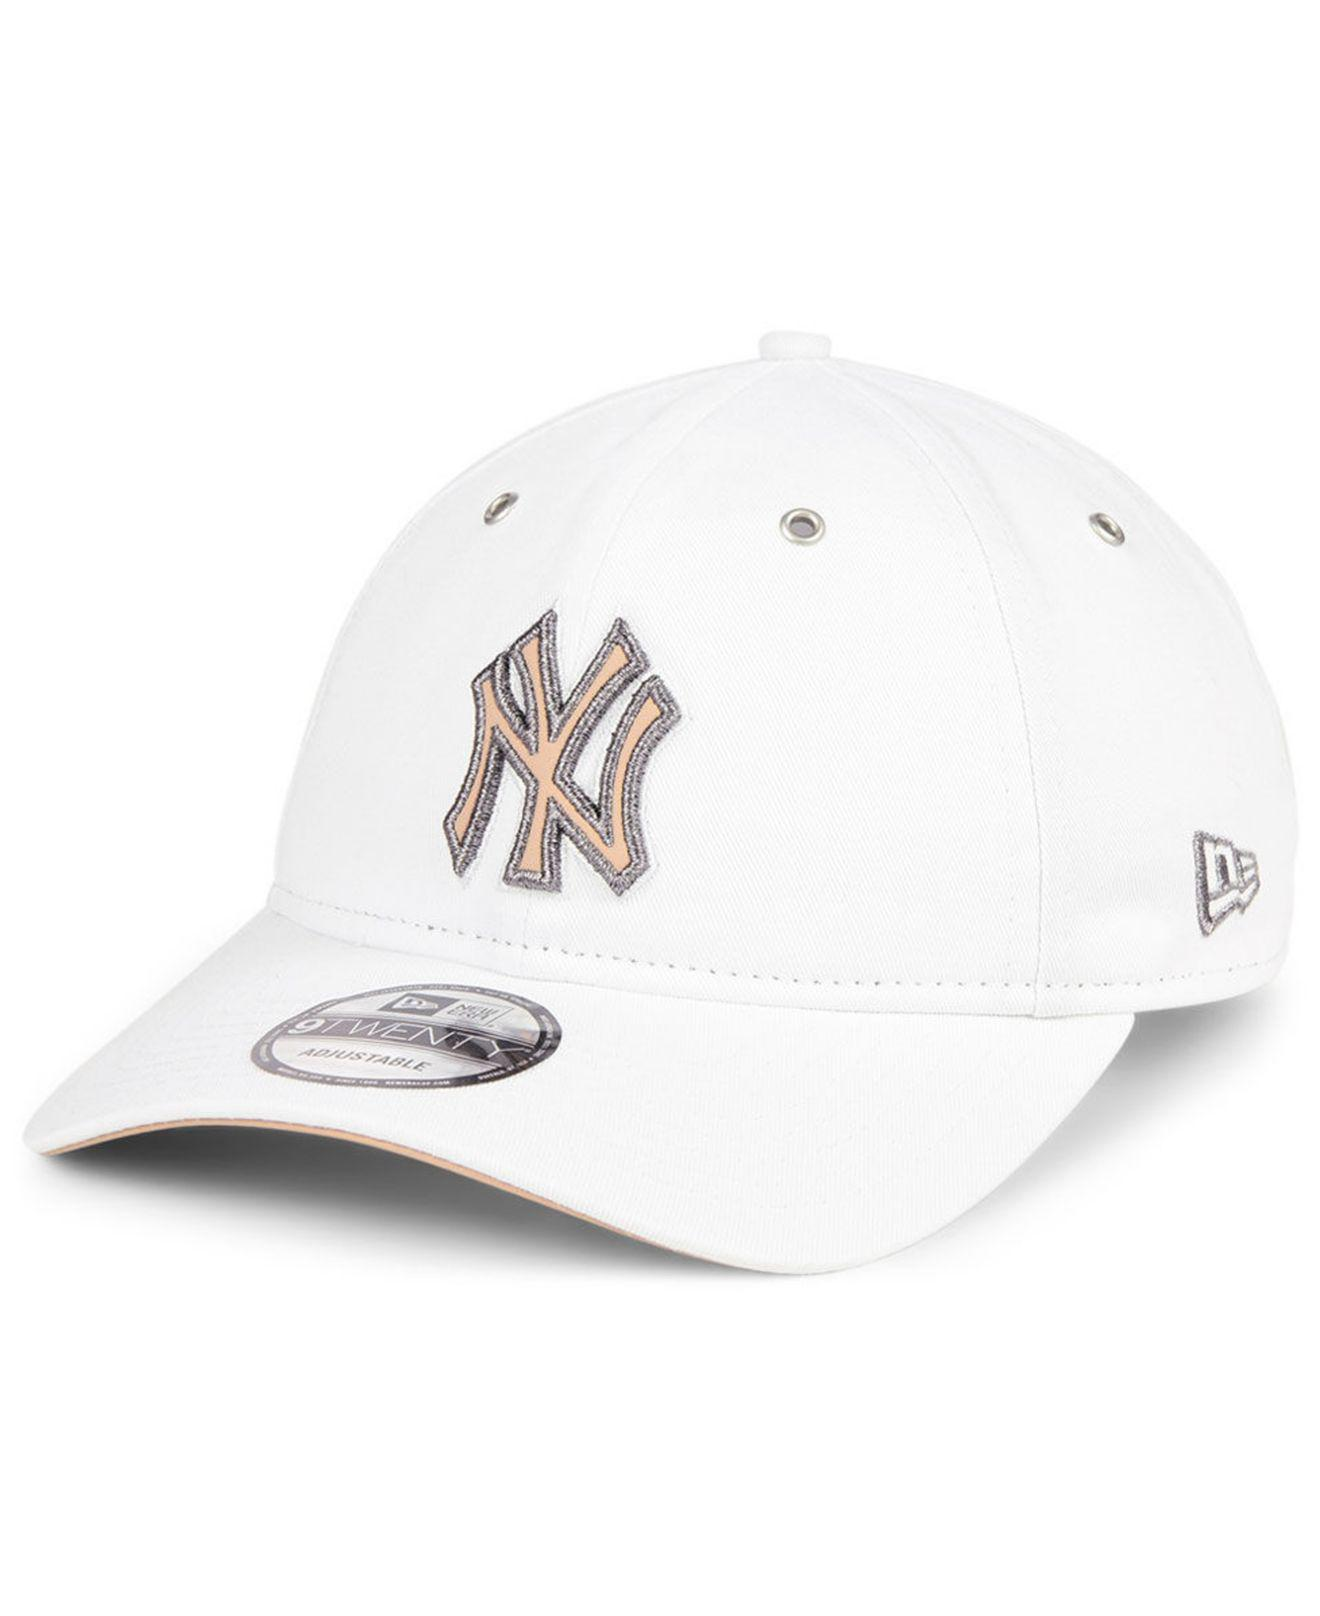 4d76cd16b0146 Lyst - KTZ New York Yankees Metallic Pastel 9twenty Cap in White